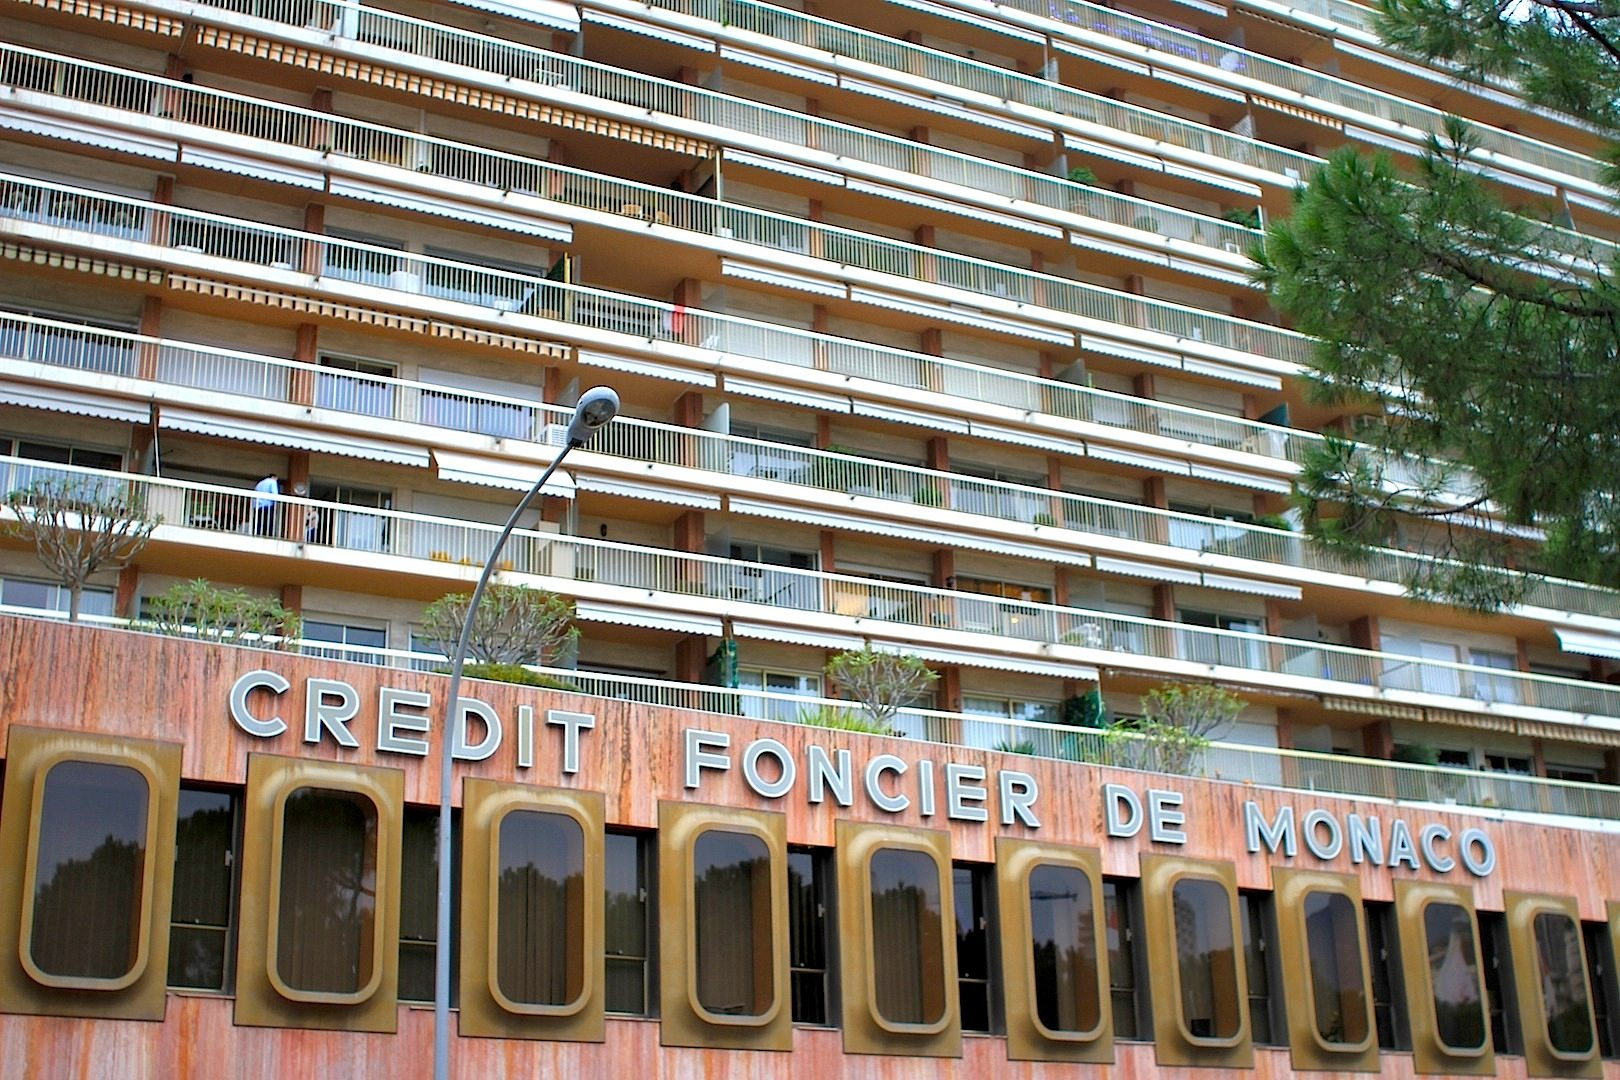 Credit Foncier de Monaco.  Wie ein Ring umfasst das Bankhaus das 14-stöckige Le Shangri-La